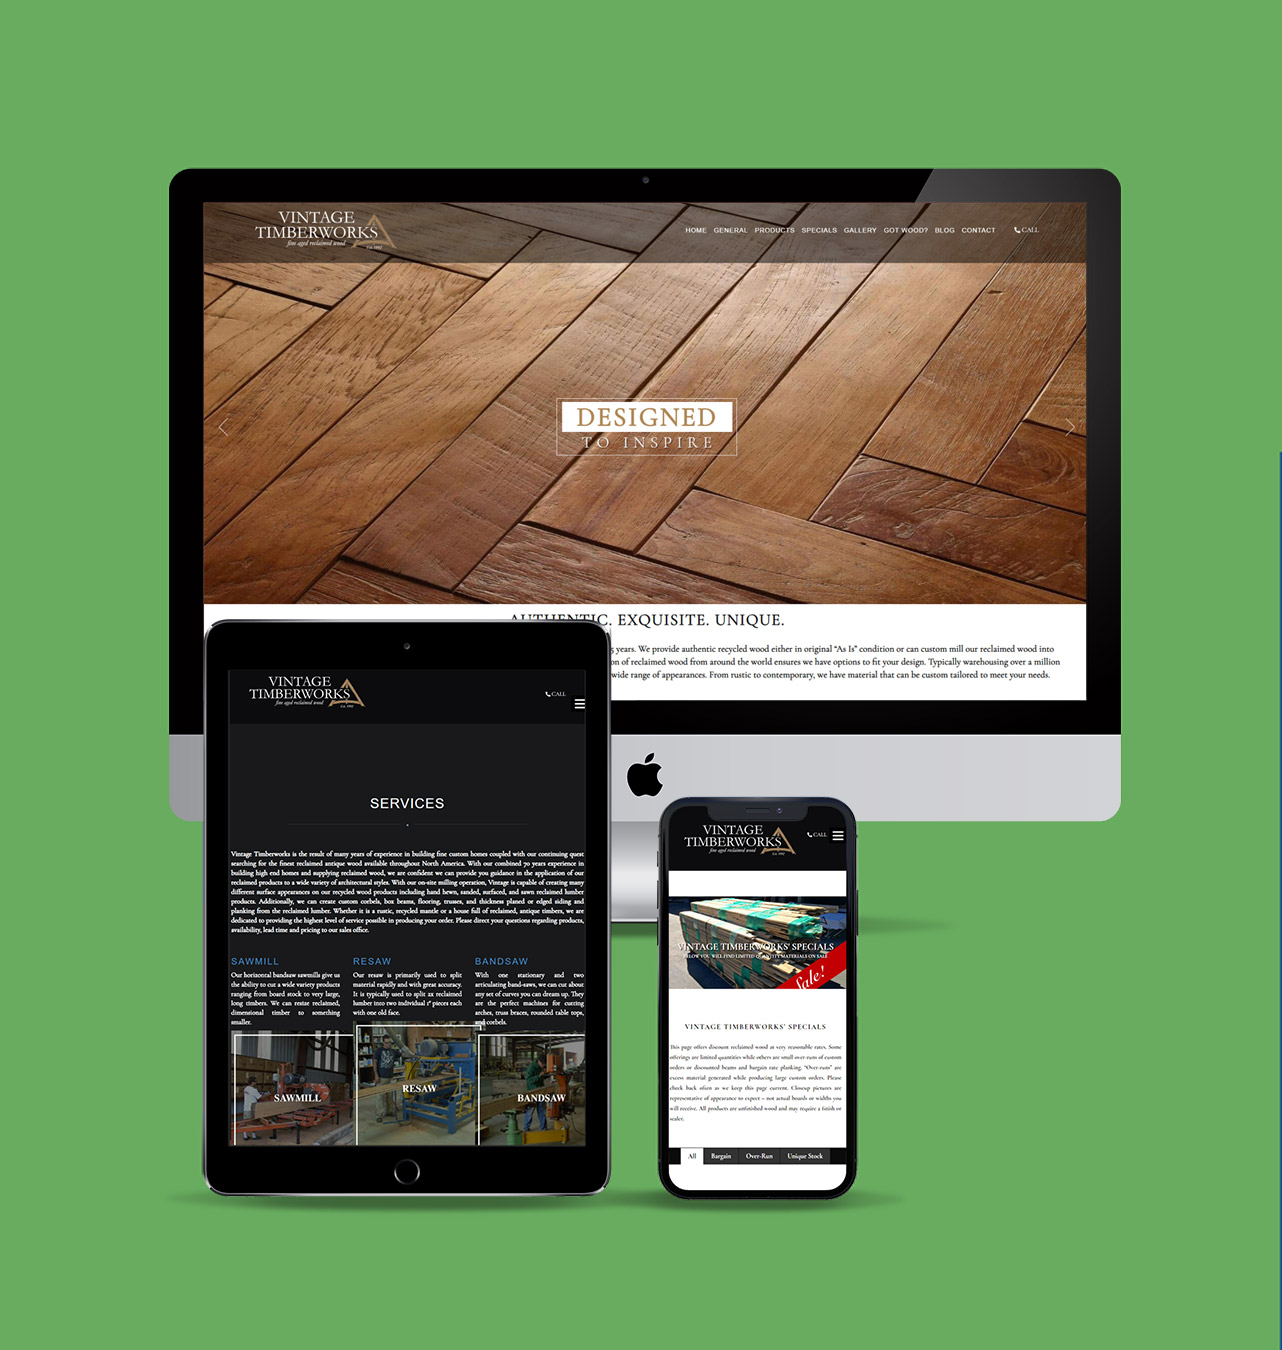 Vintage Timberworks website